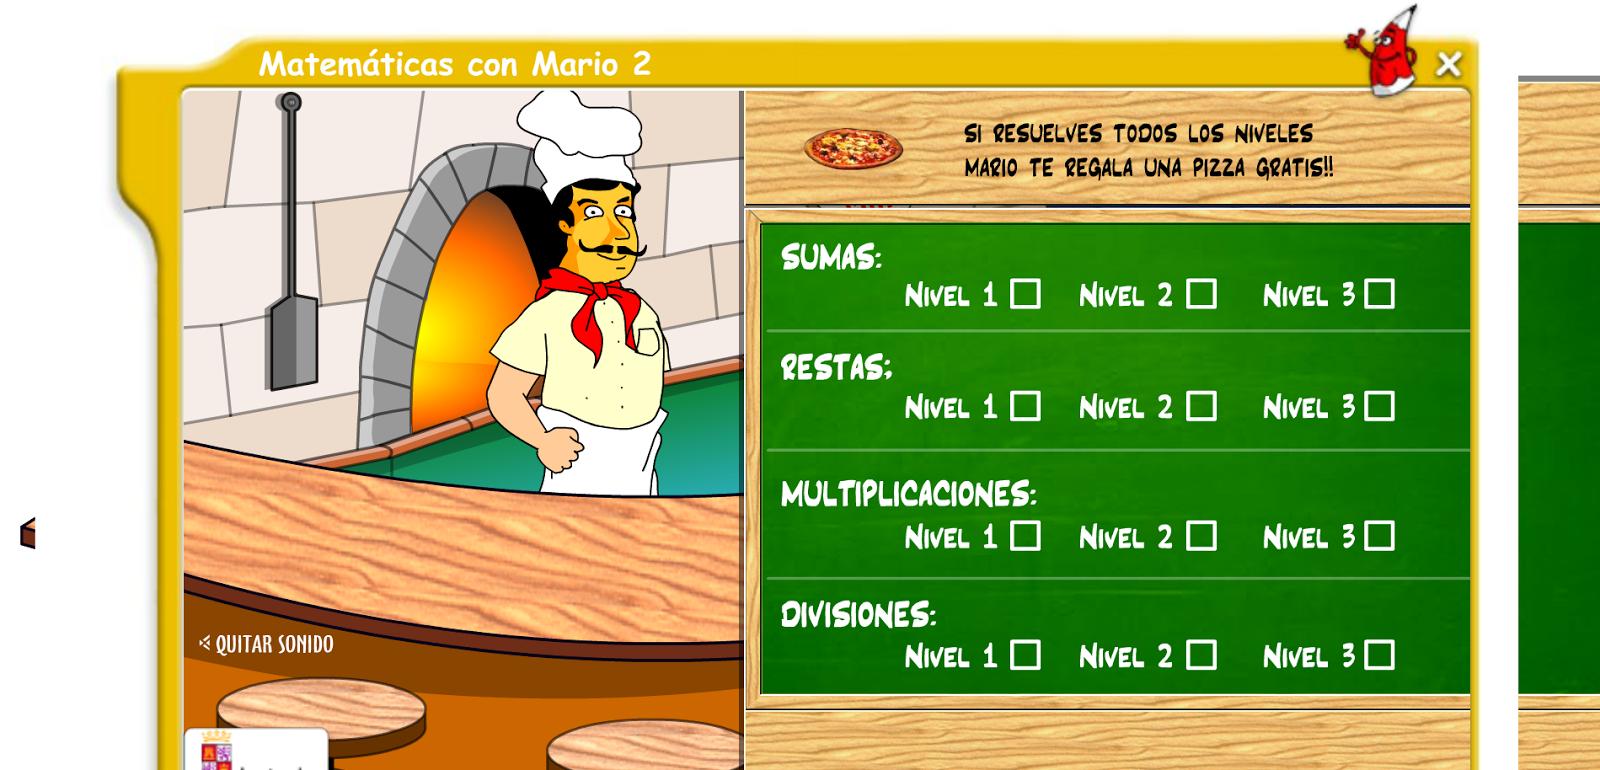 Matemáticas con Mario